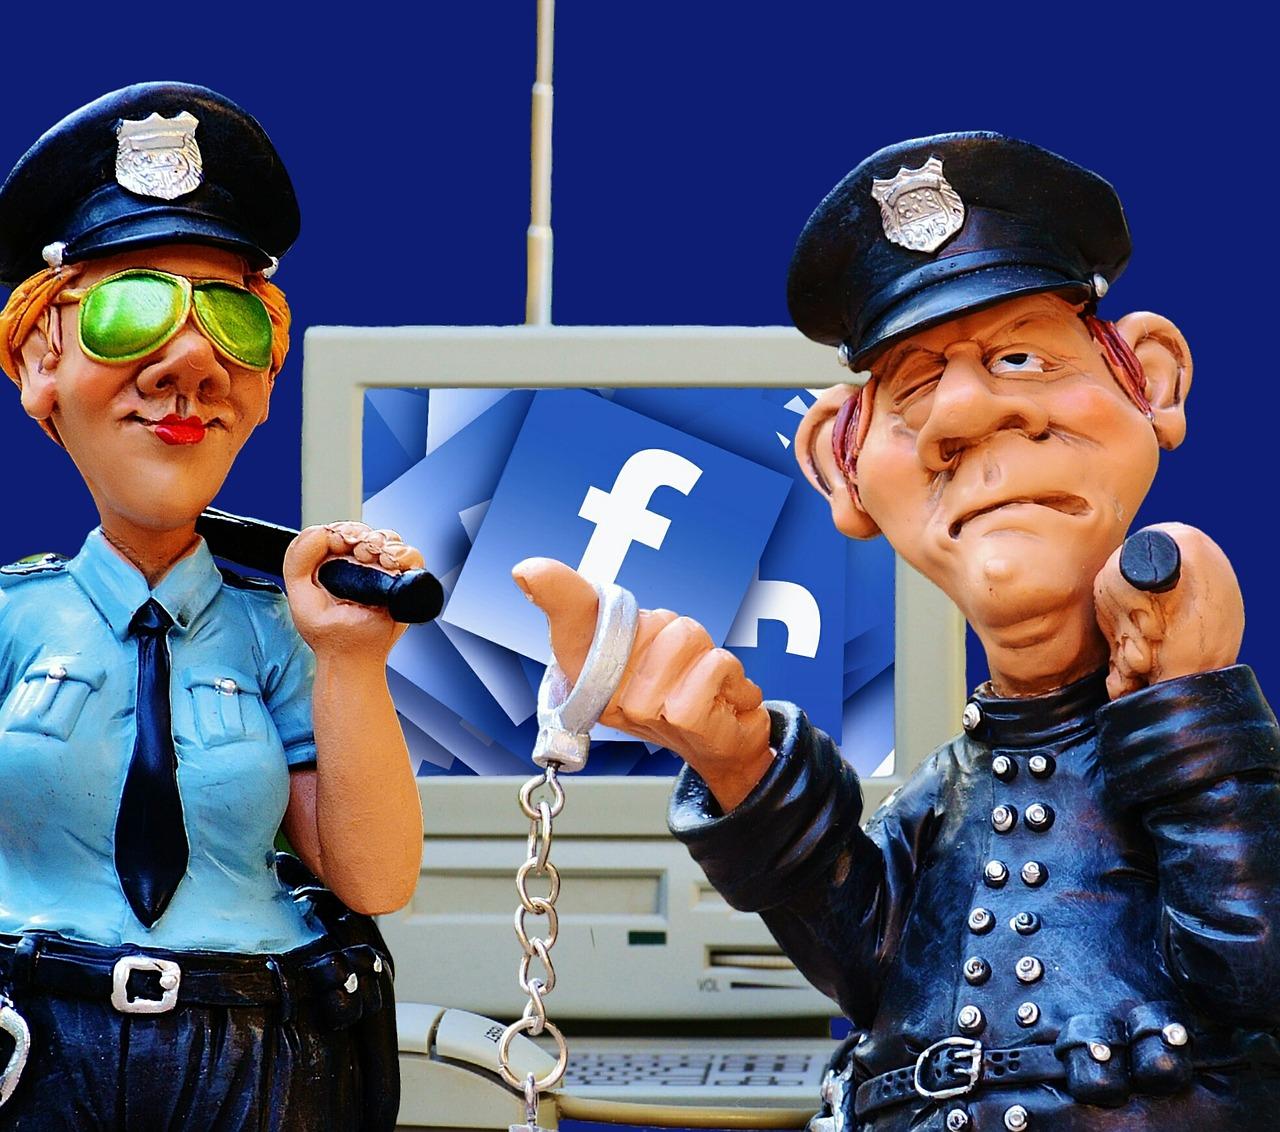 computer-security-social-media-1679234_1280